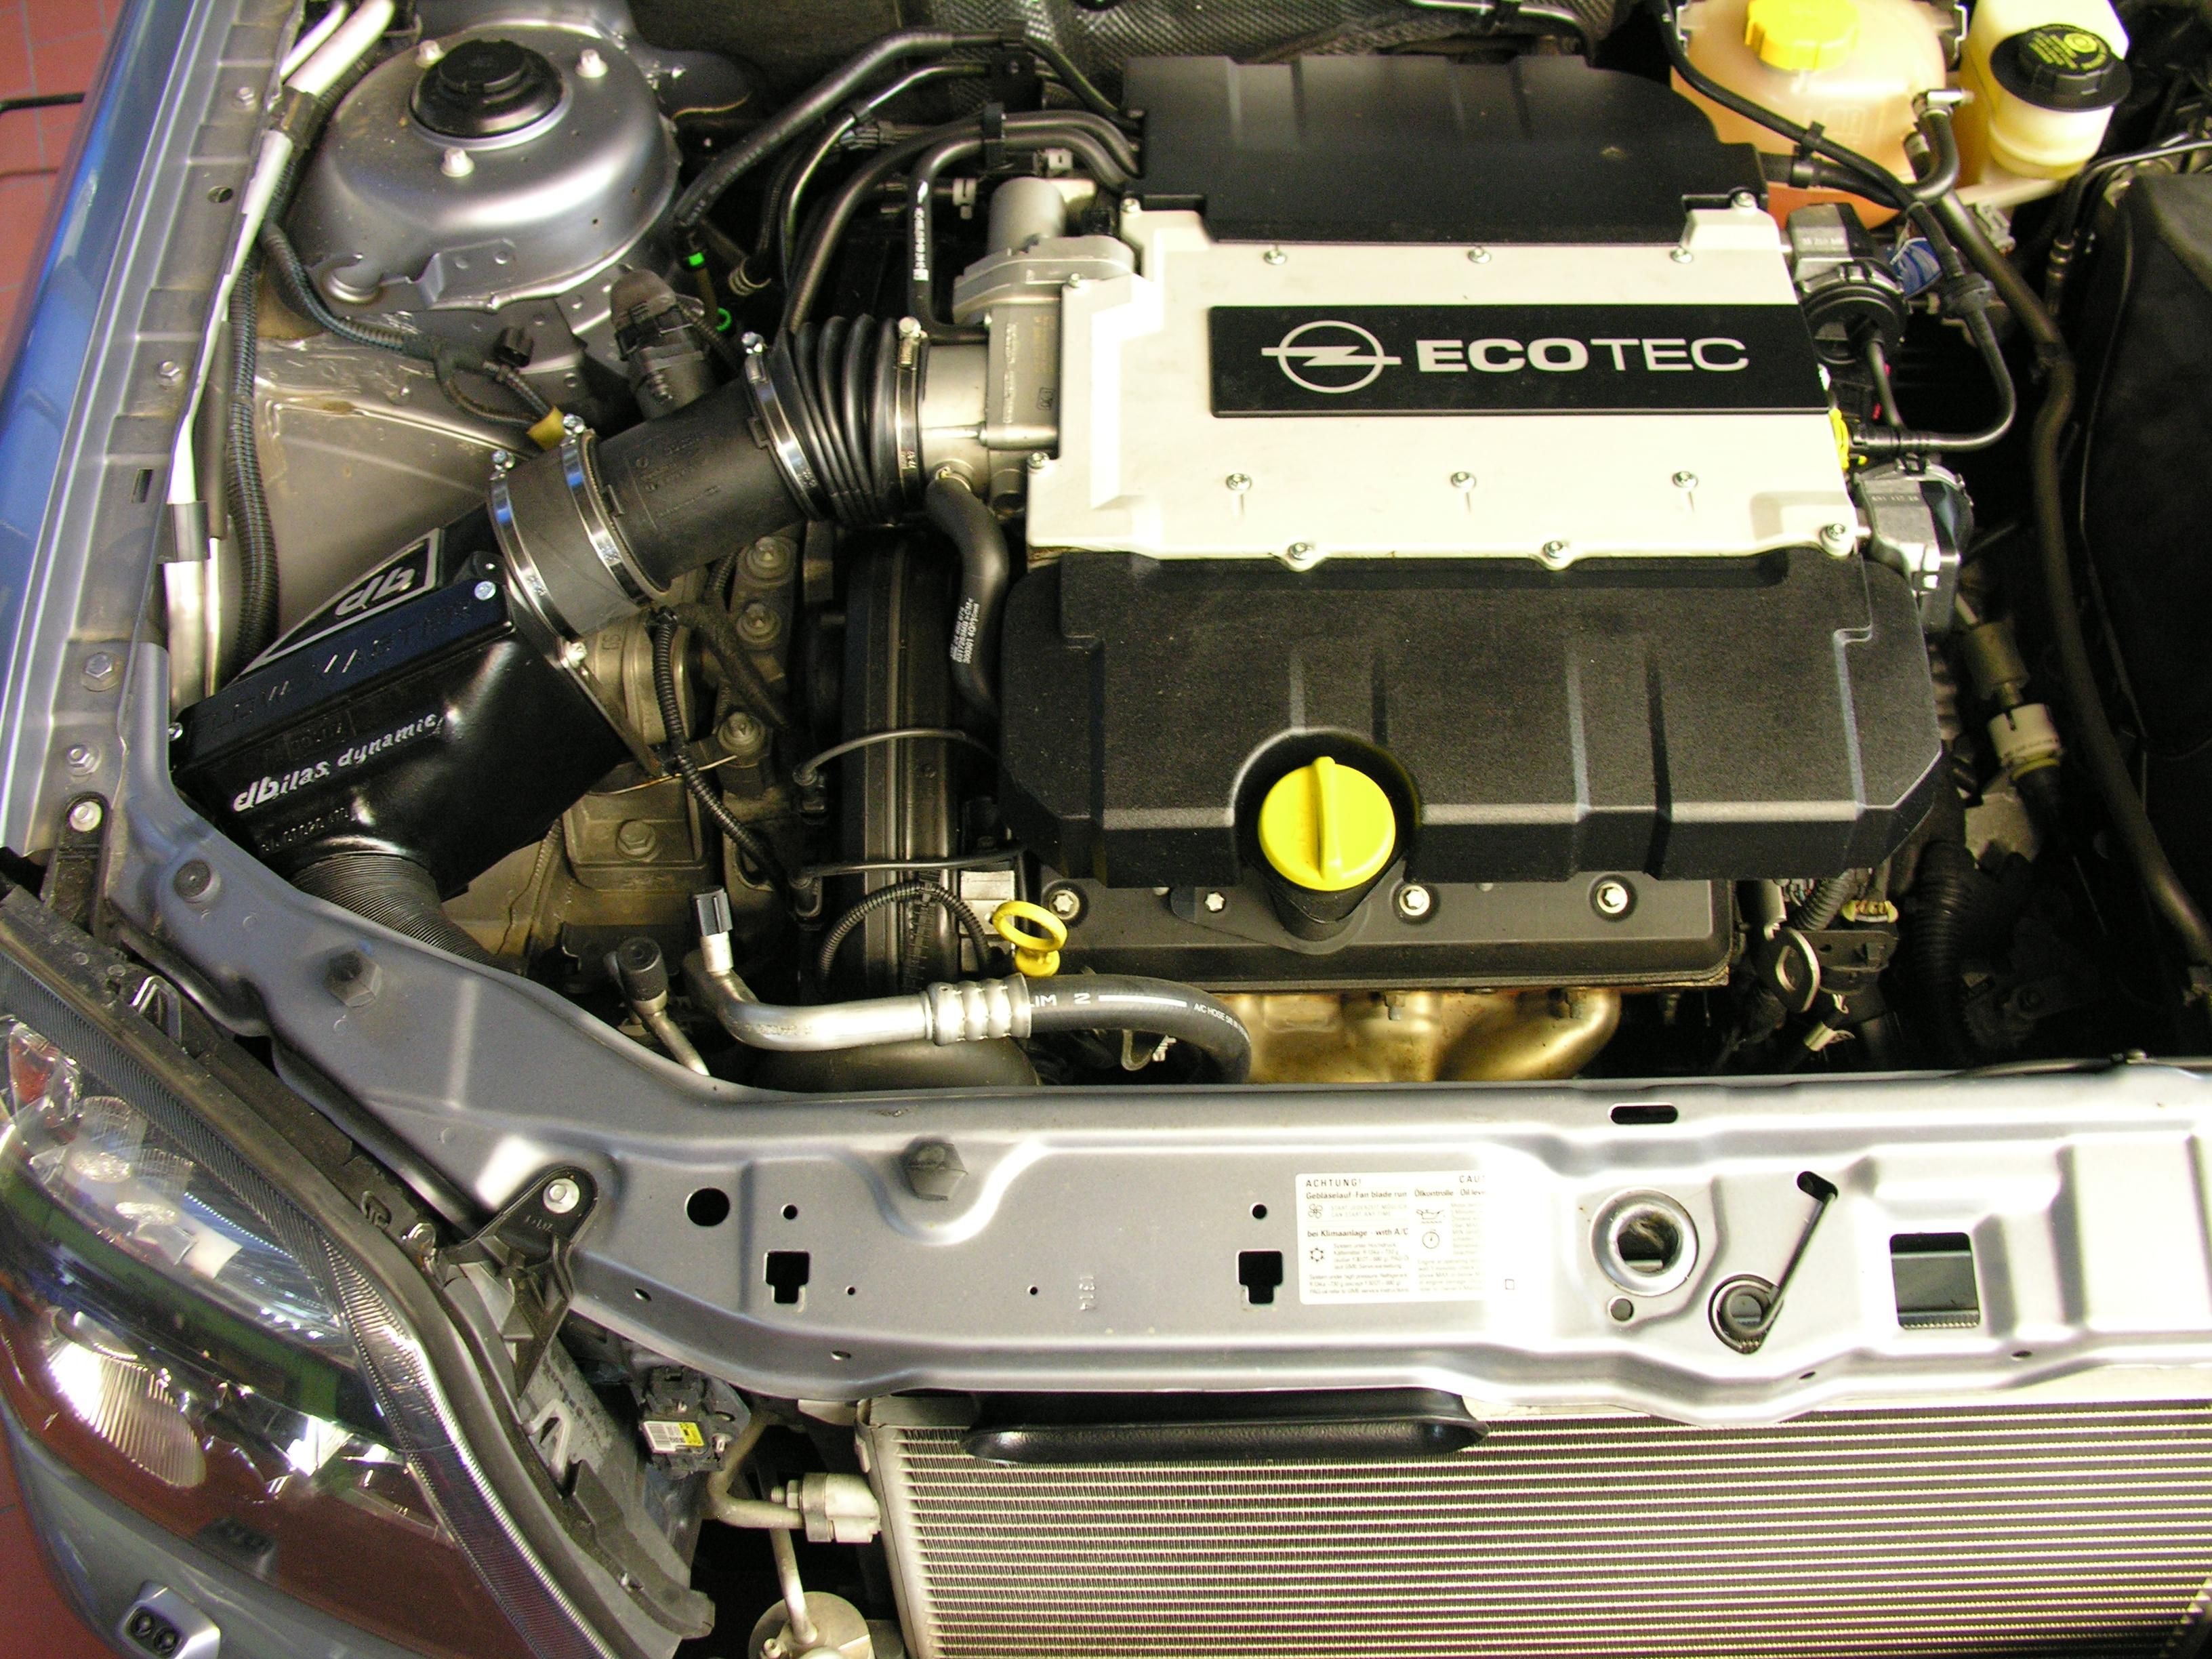 FlowMaster Kit Opel / Vauxhall Vectra C, Signum, Omega B 1 6 - 3 2